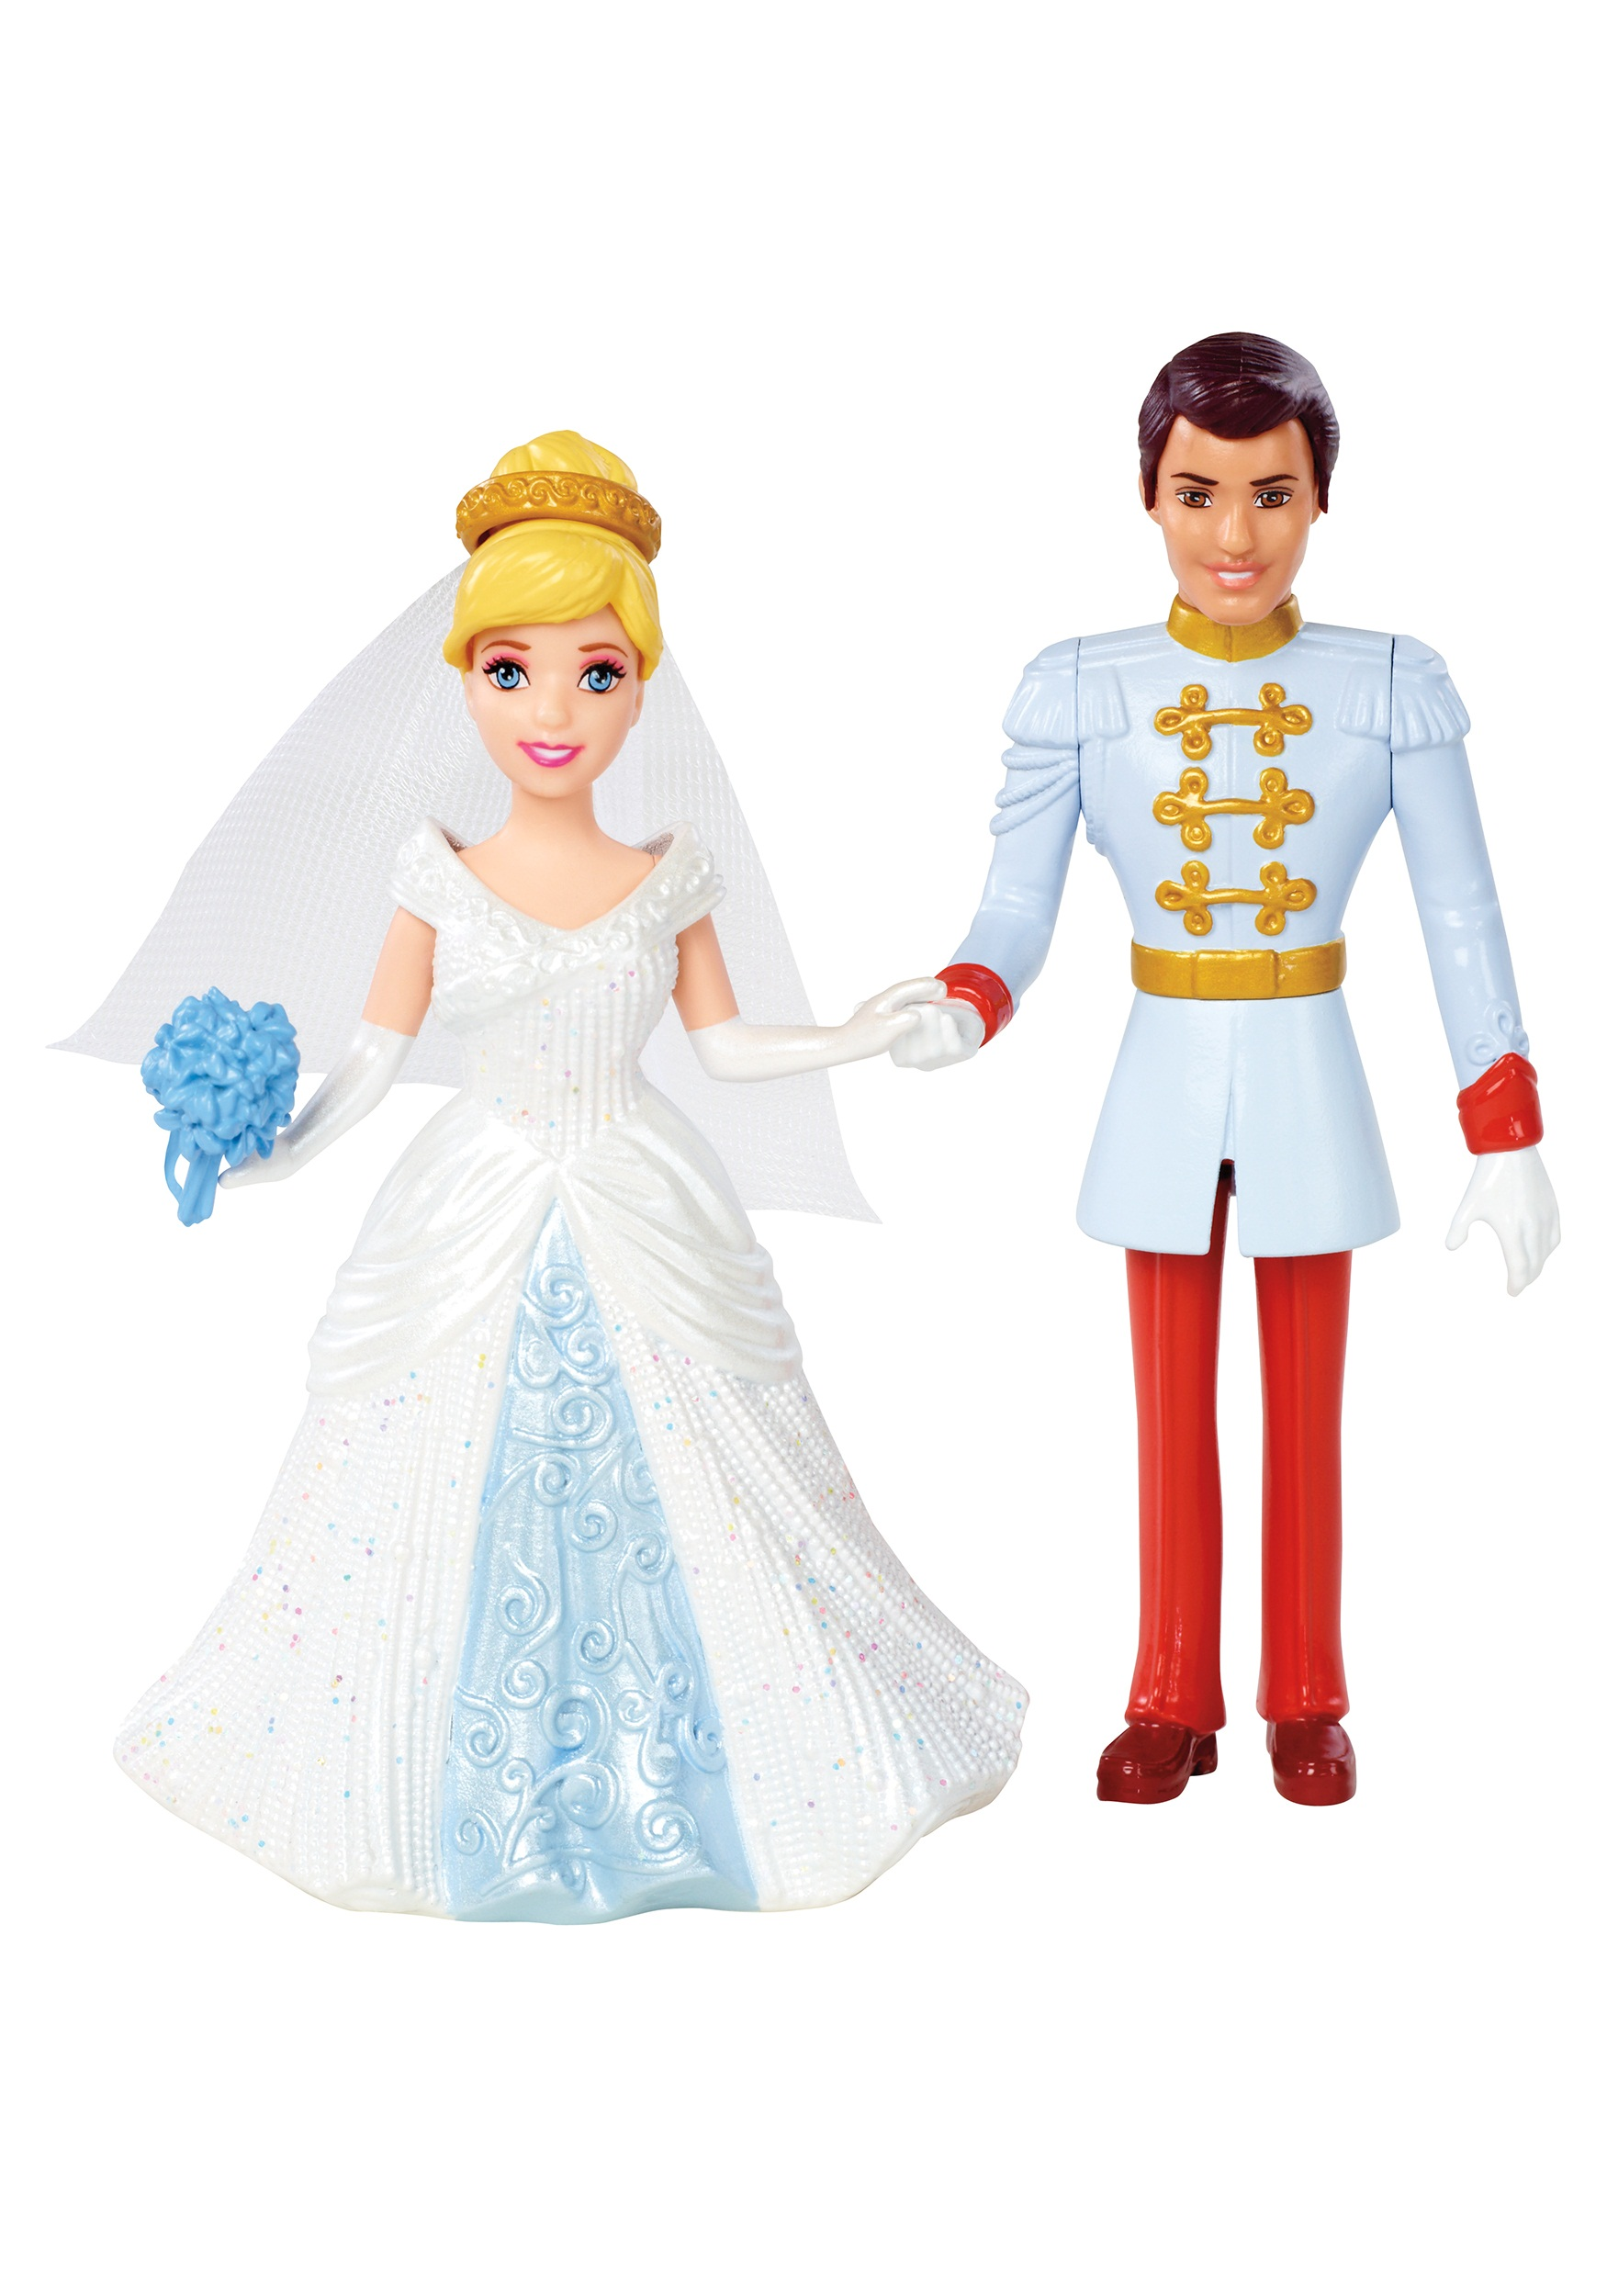 Fairytale Wedding Cinderella and Prince Charming